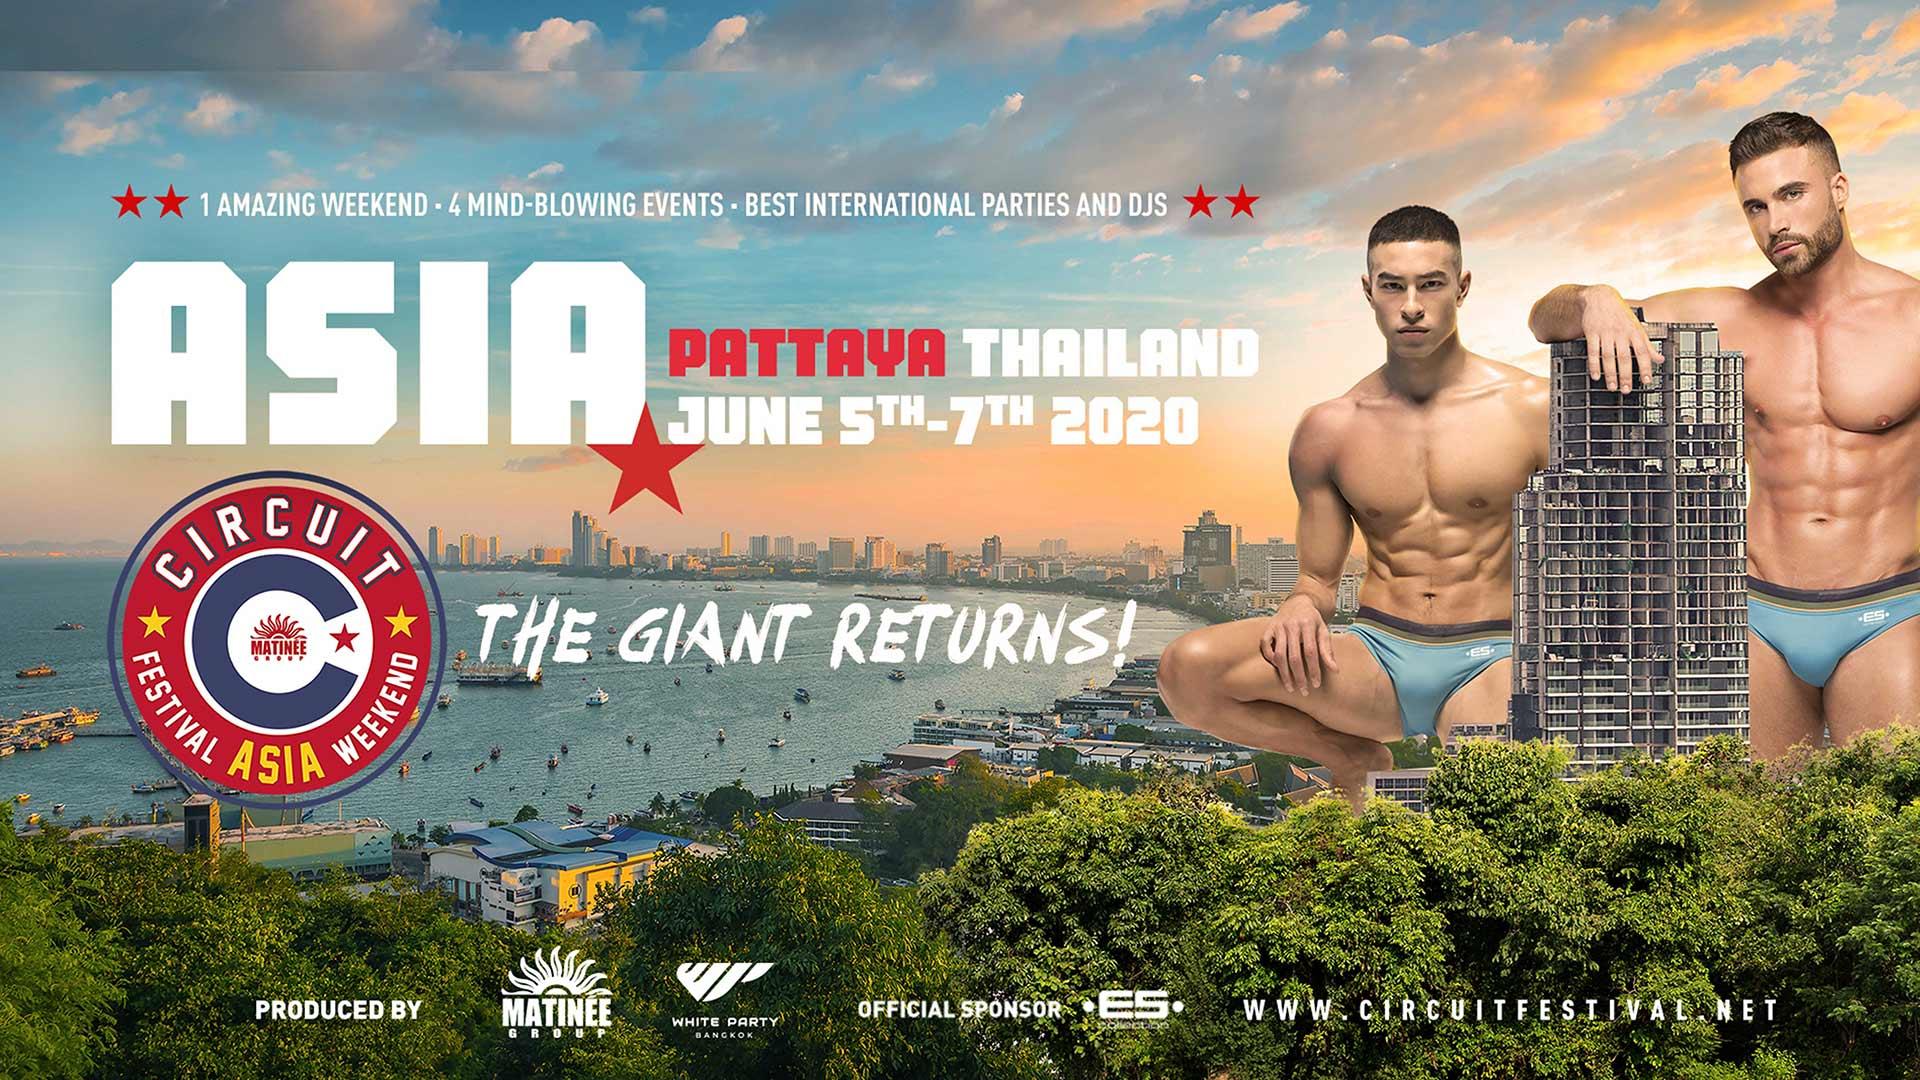 asia-circuit-festival-gay-party-parties-events-thailandia